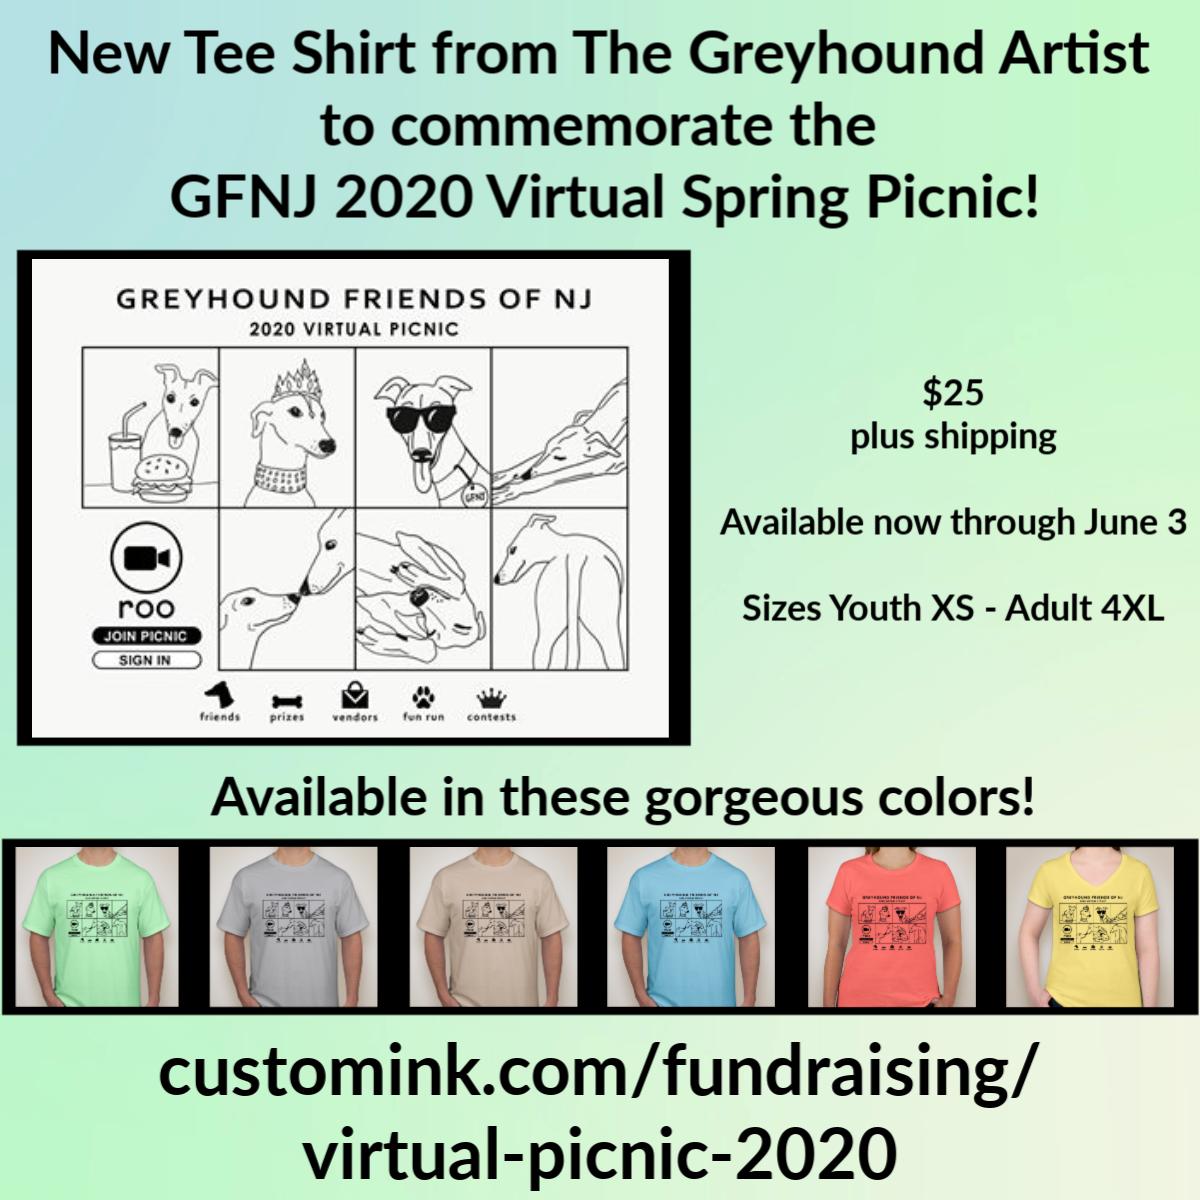 2020 Virtual Picnic Tee Shirt